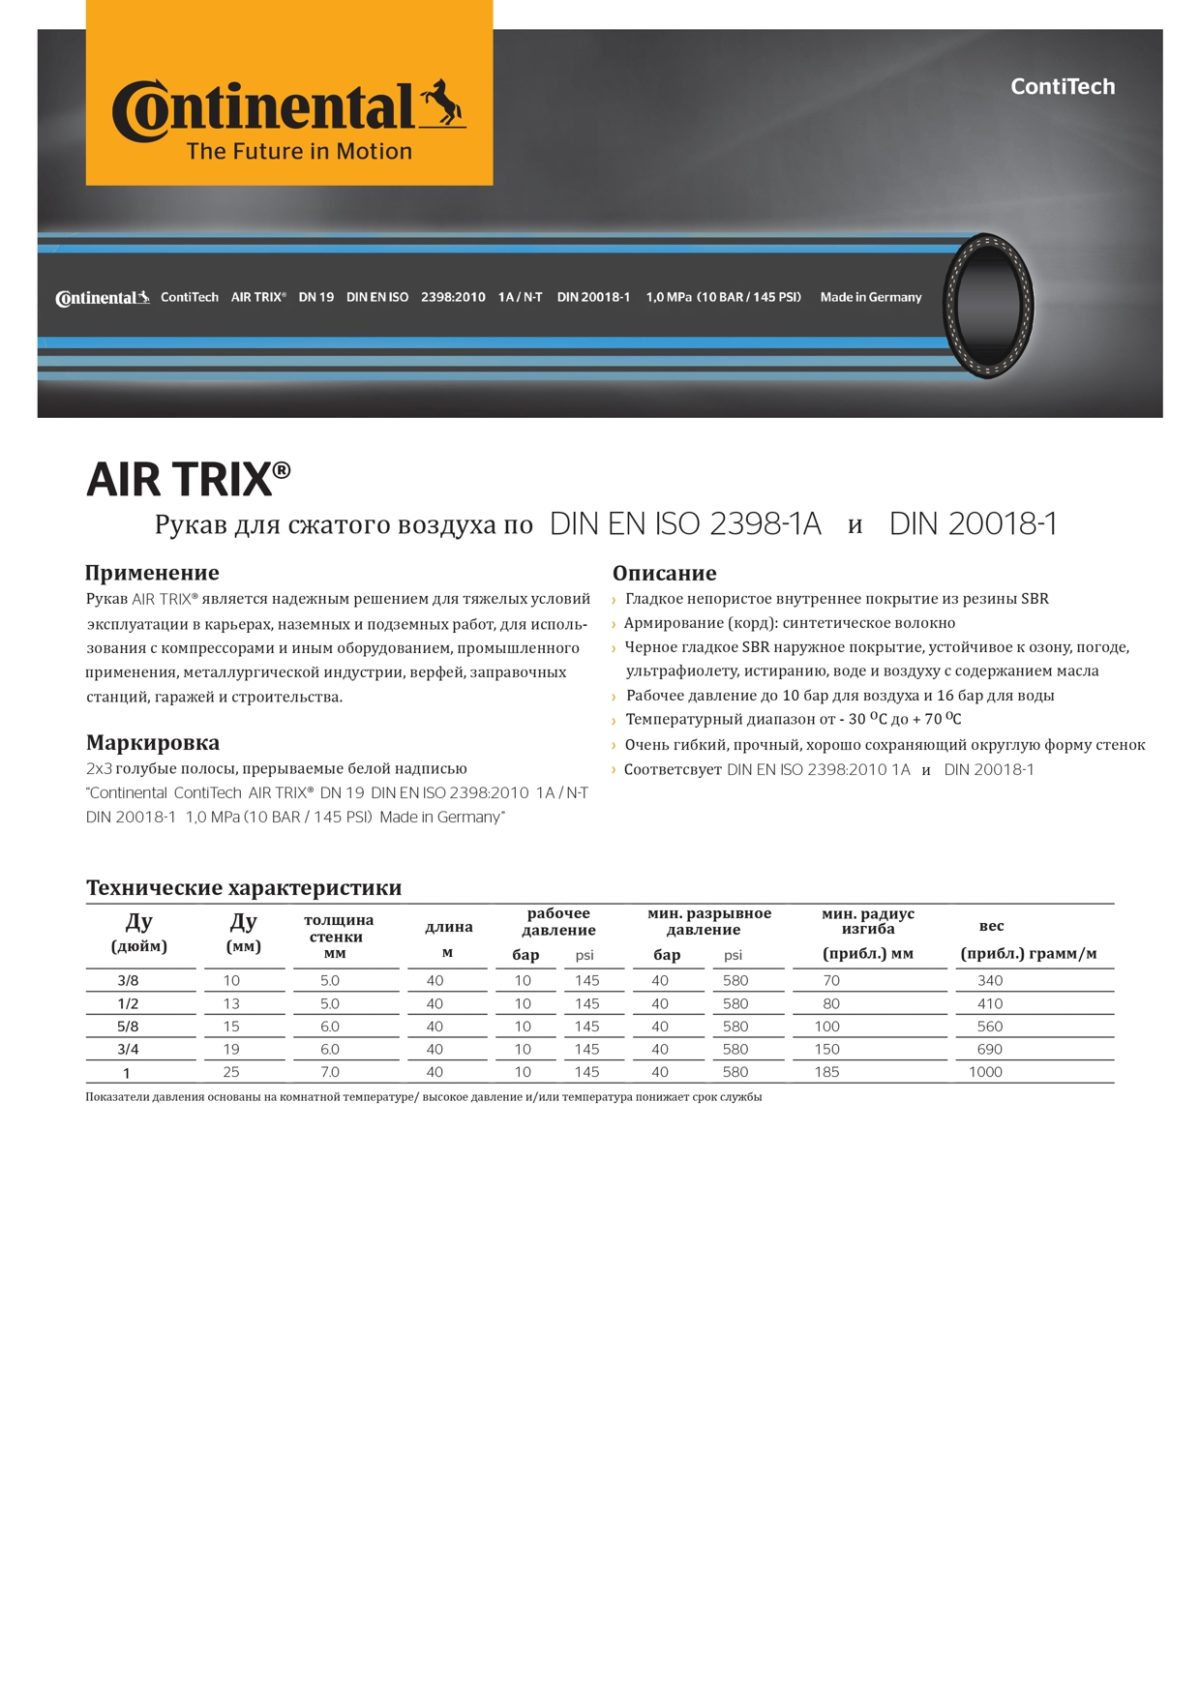 AIR TRIX Рукав для сжатого воздуха